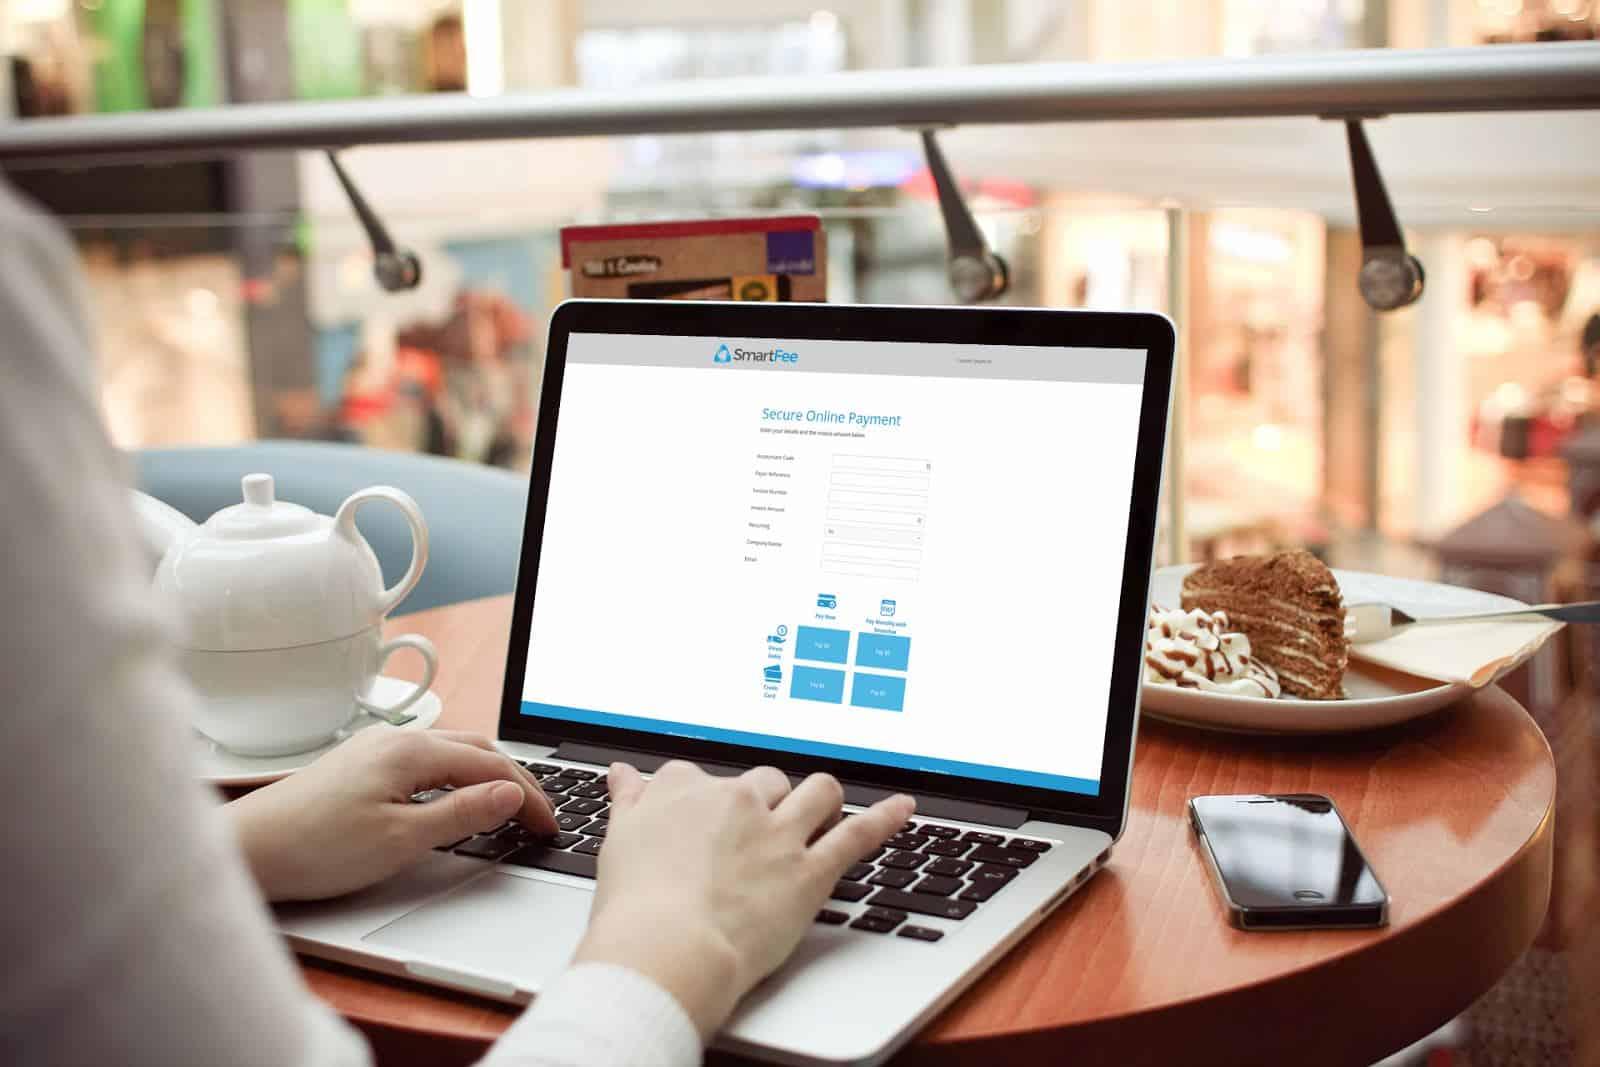 smartfee-laptop